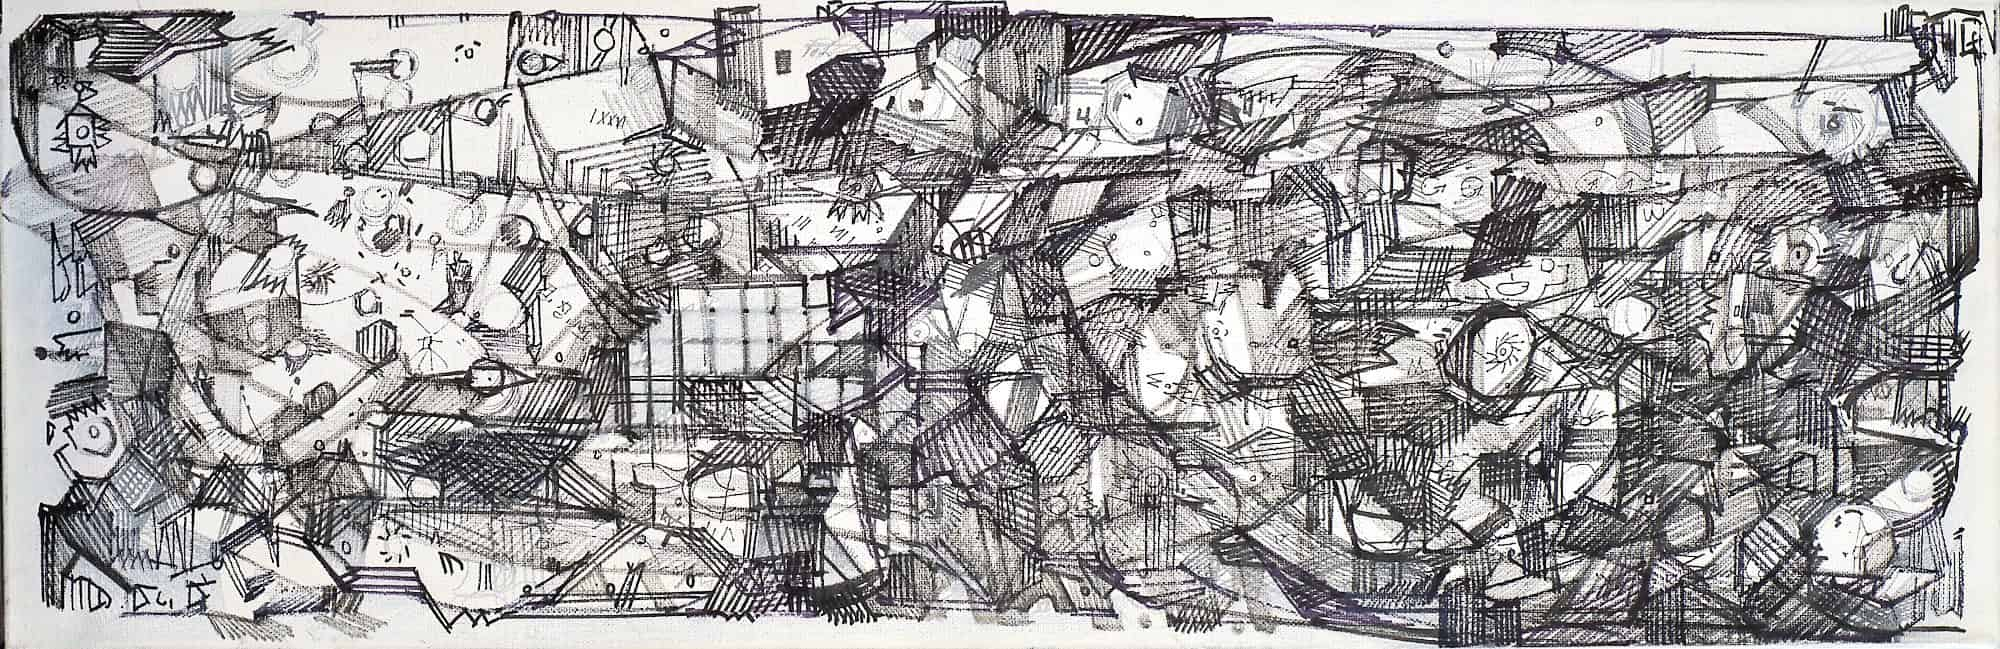 artwork02715-1500px